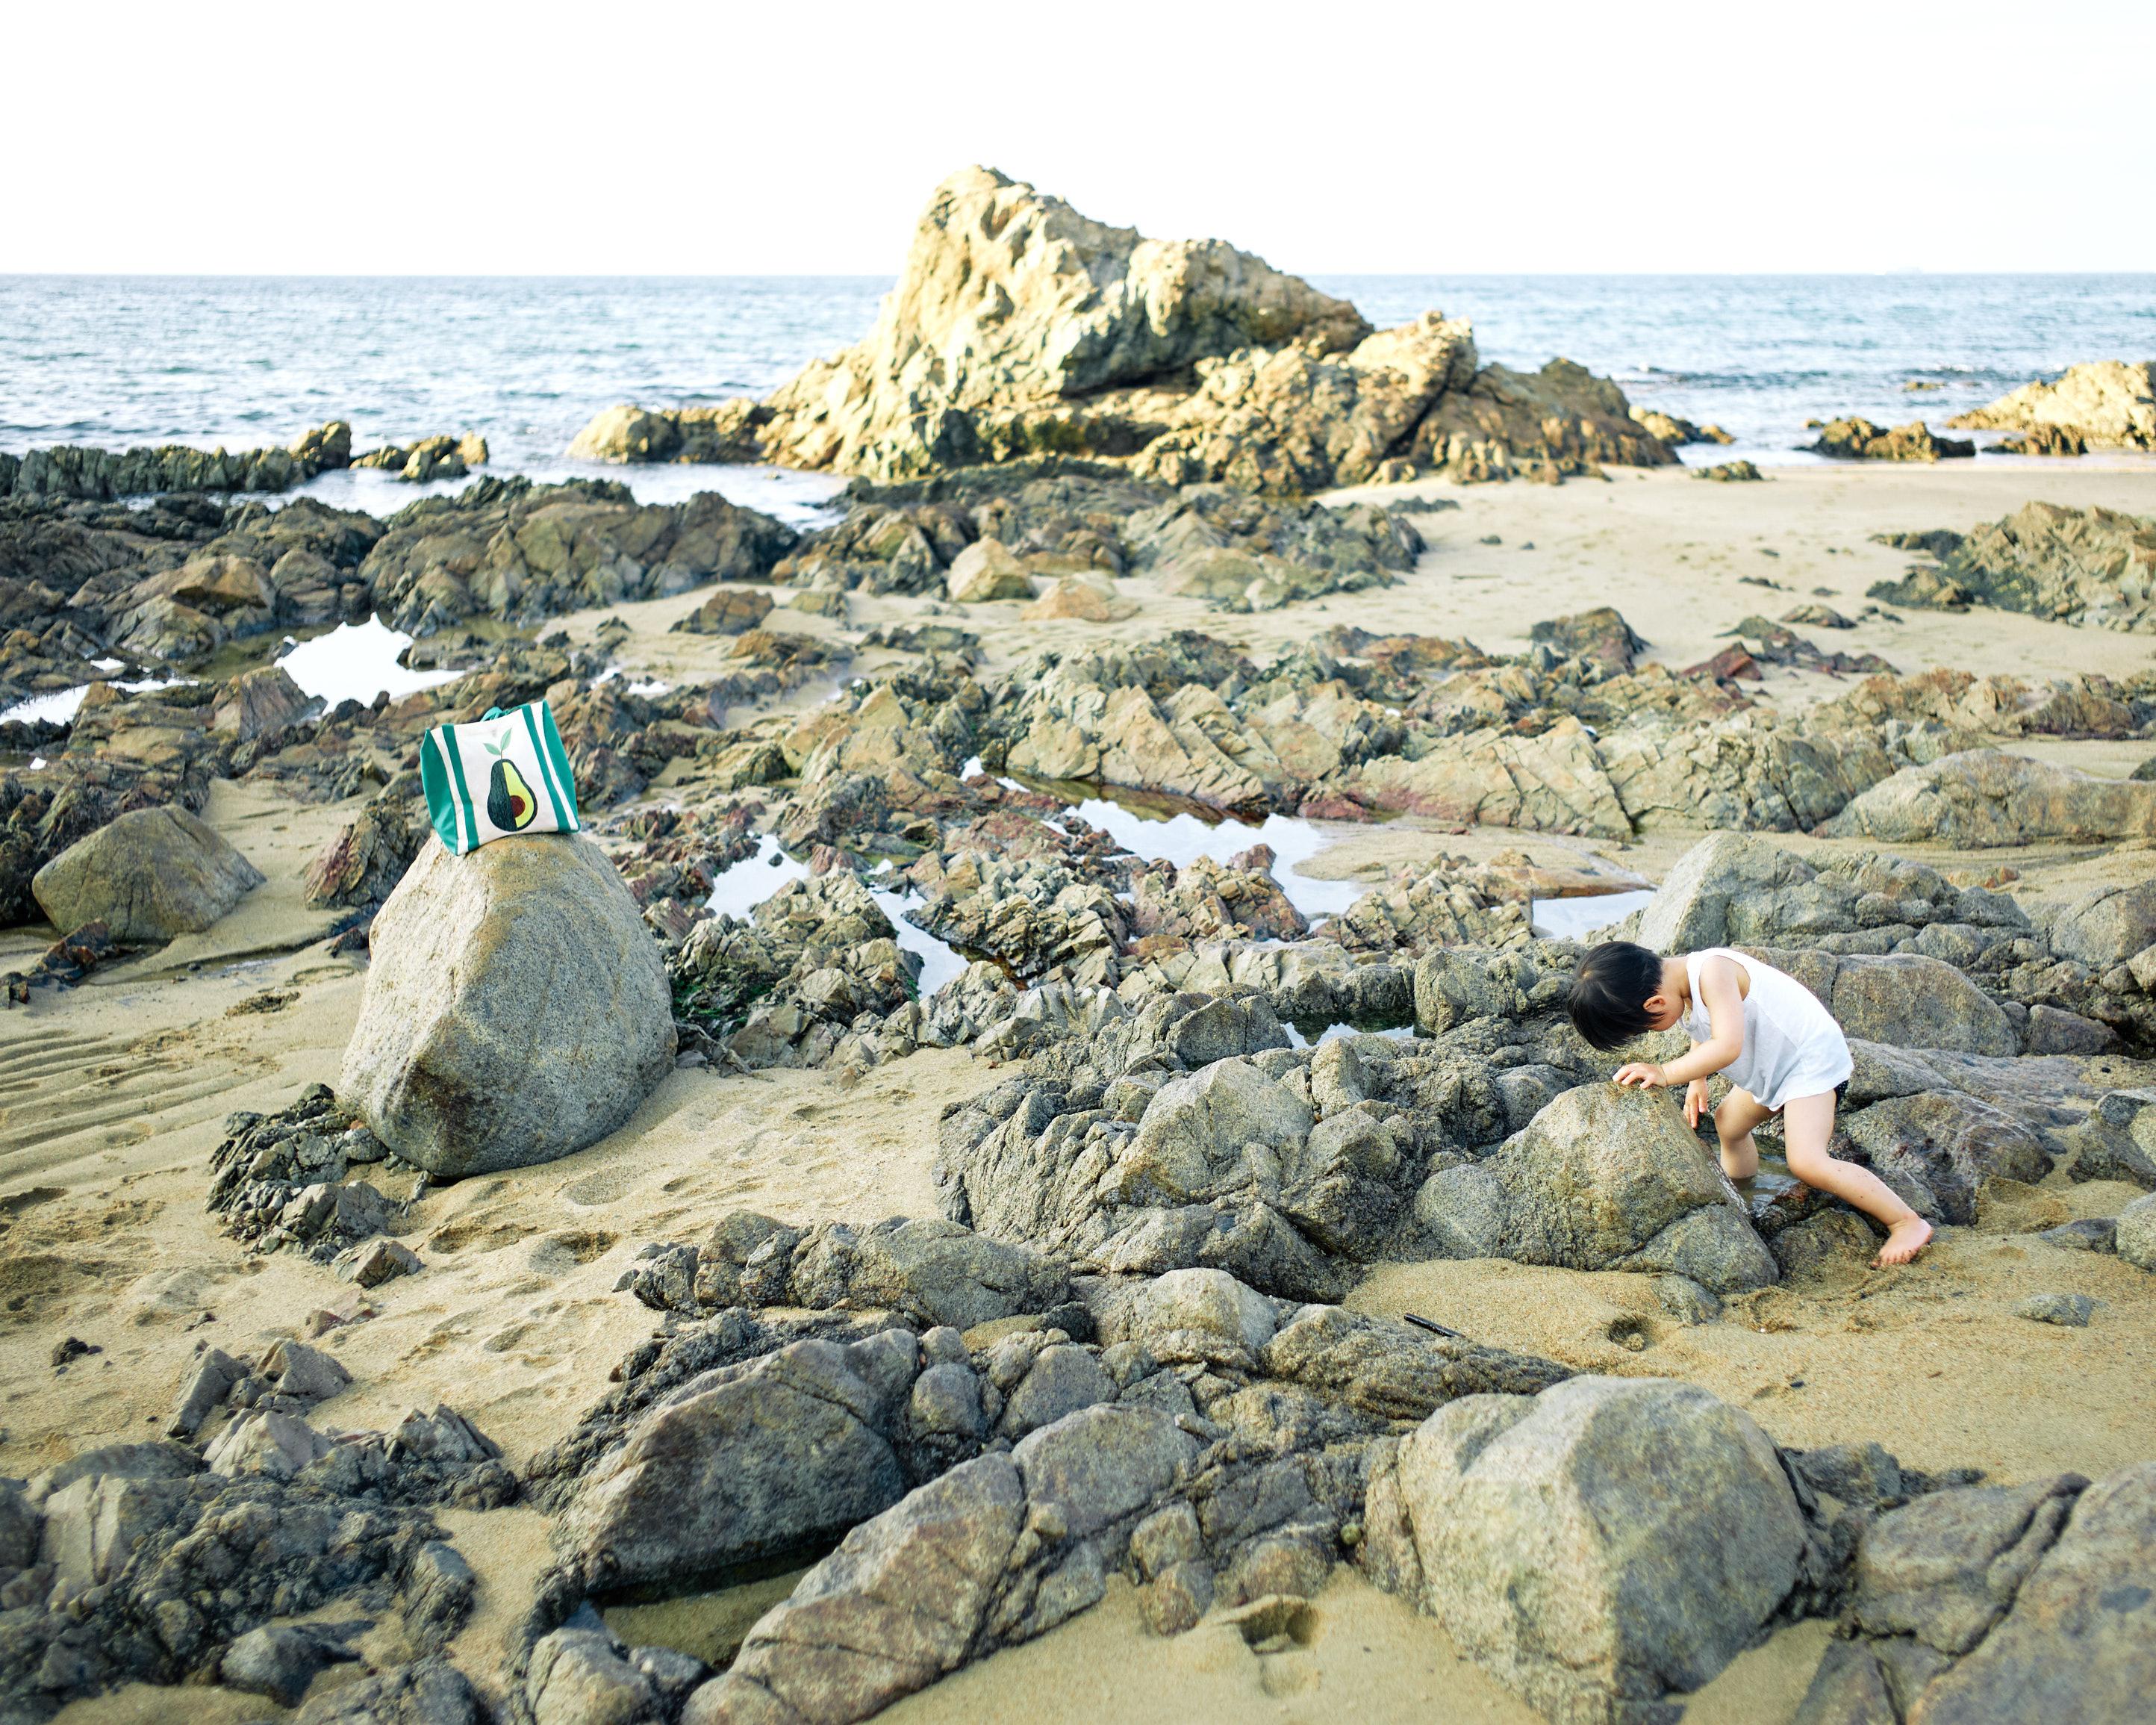 woolworth bag itoshima beach rocks child